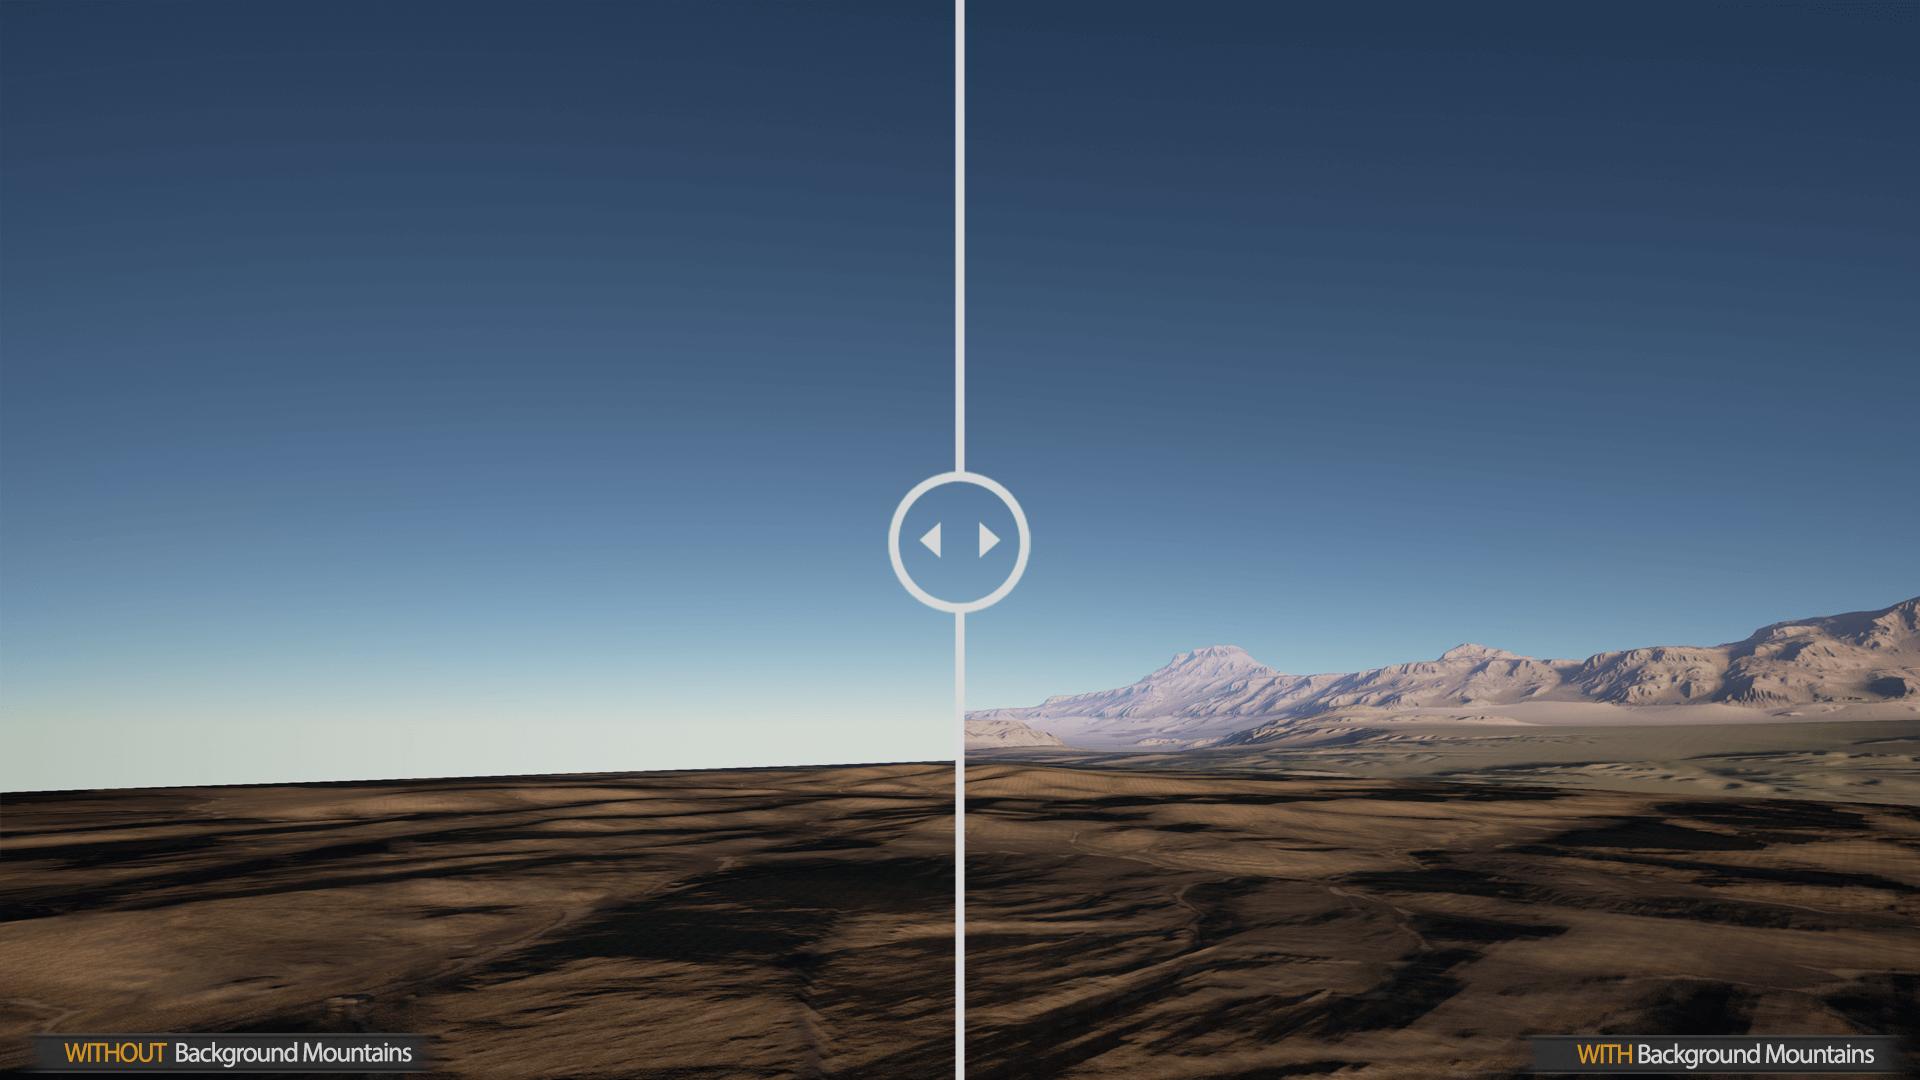 landscape backgrounds by gokhan karadayi in environments